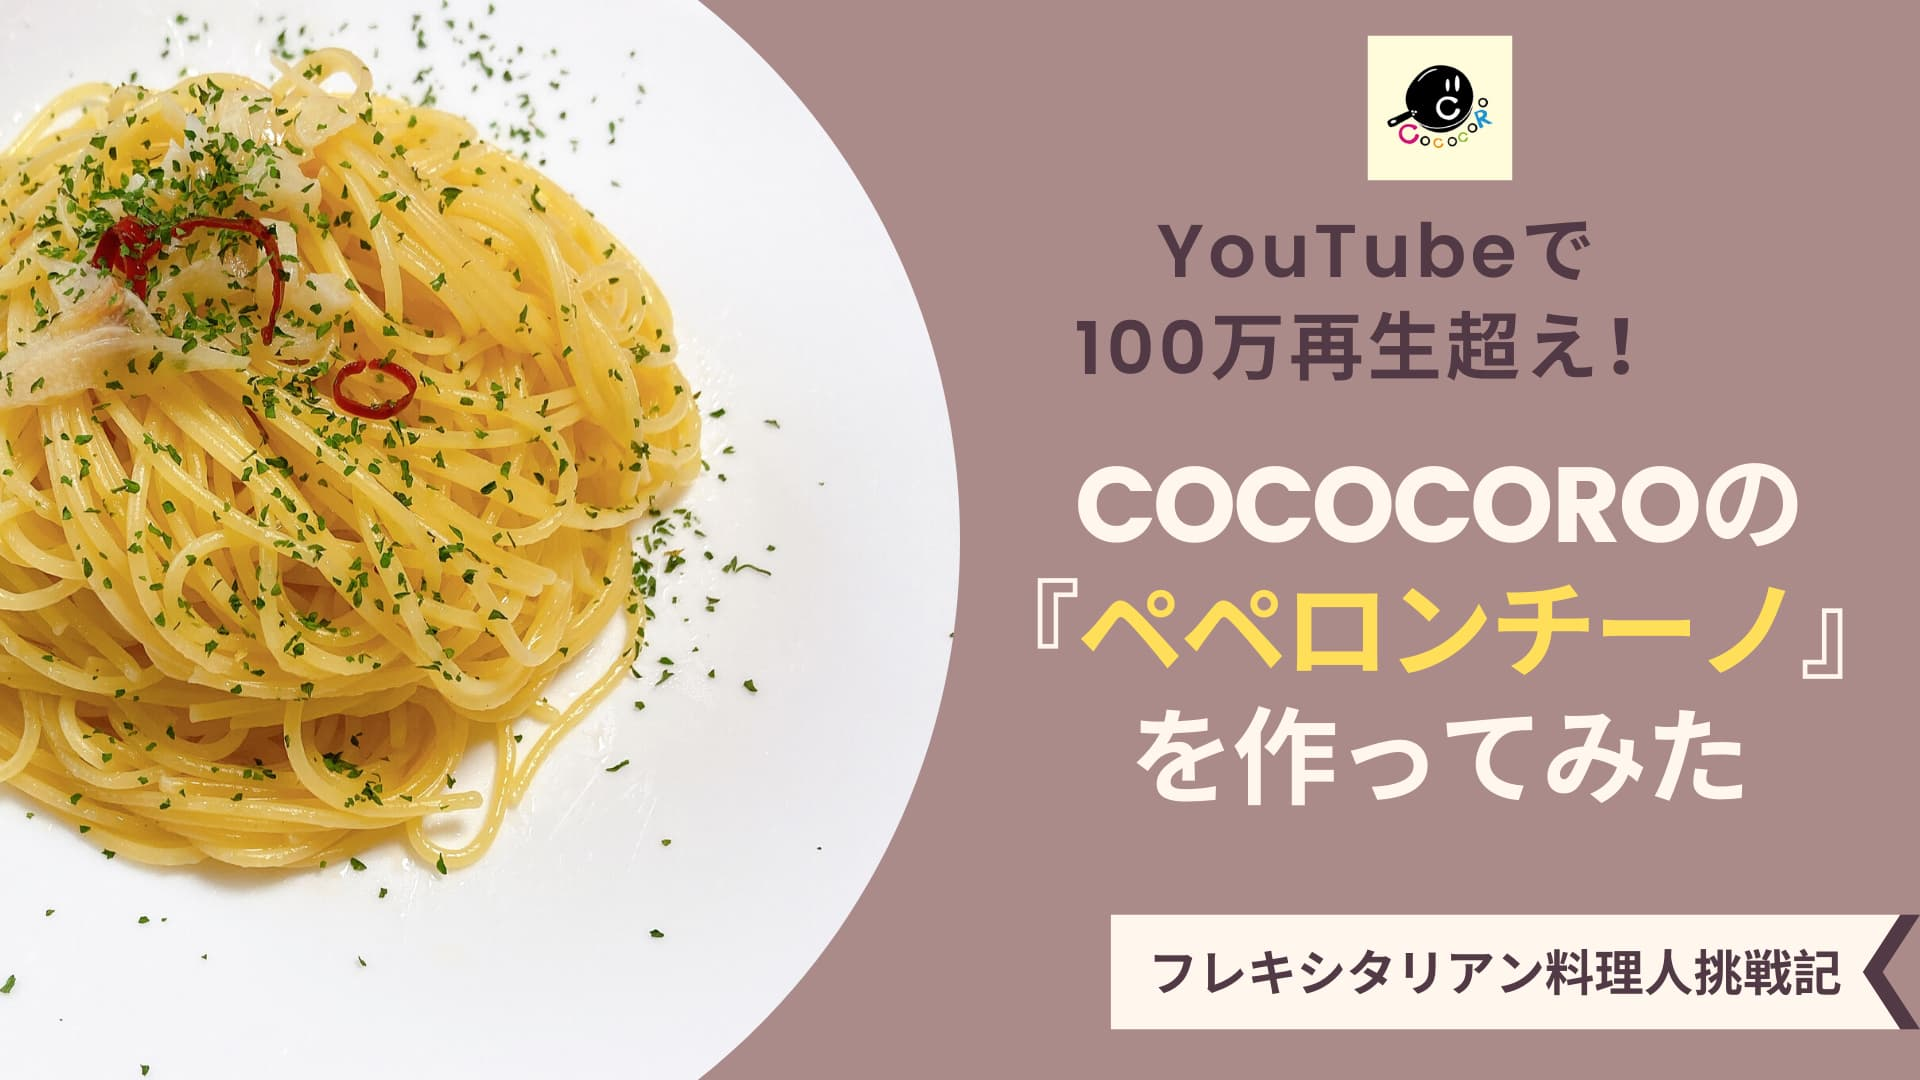 COCOCORO『ペペロンチーノ』を作ってみた アイキャッチ画像